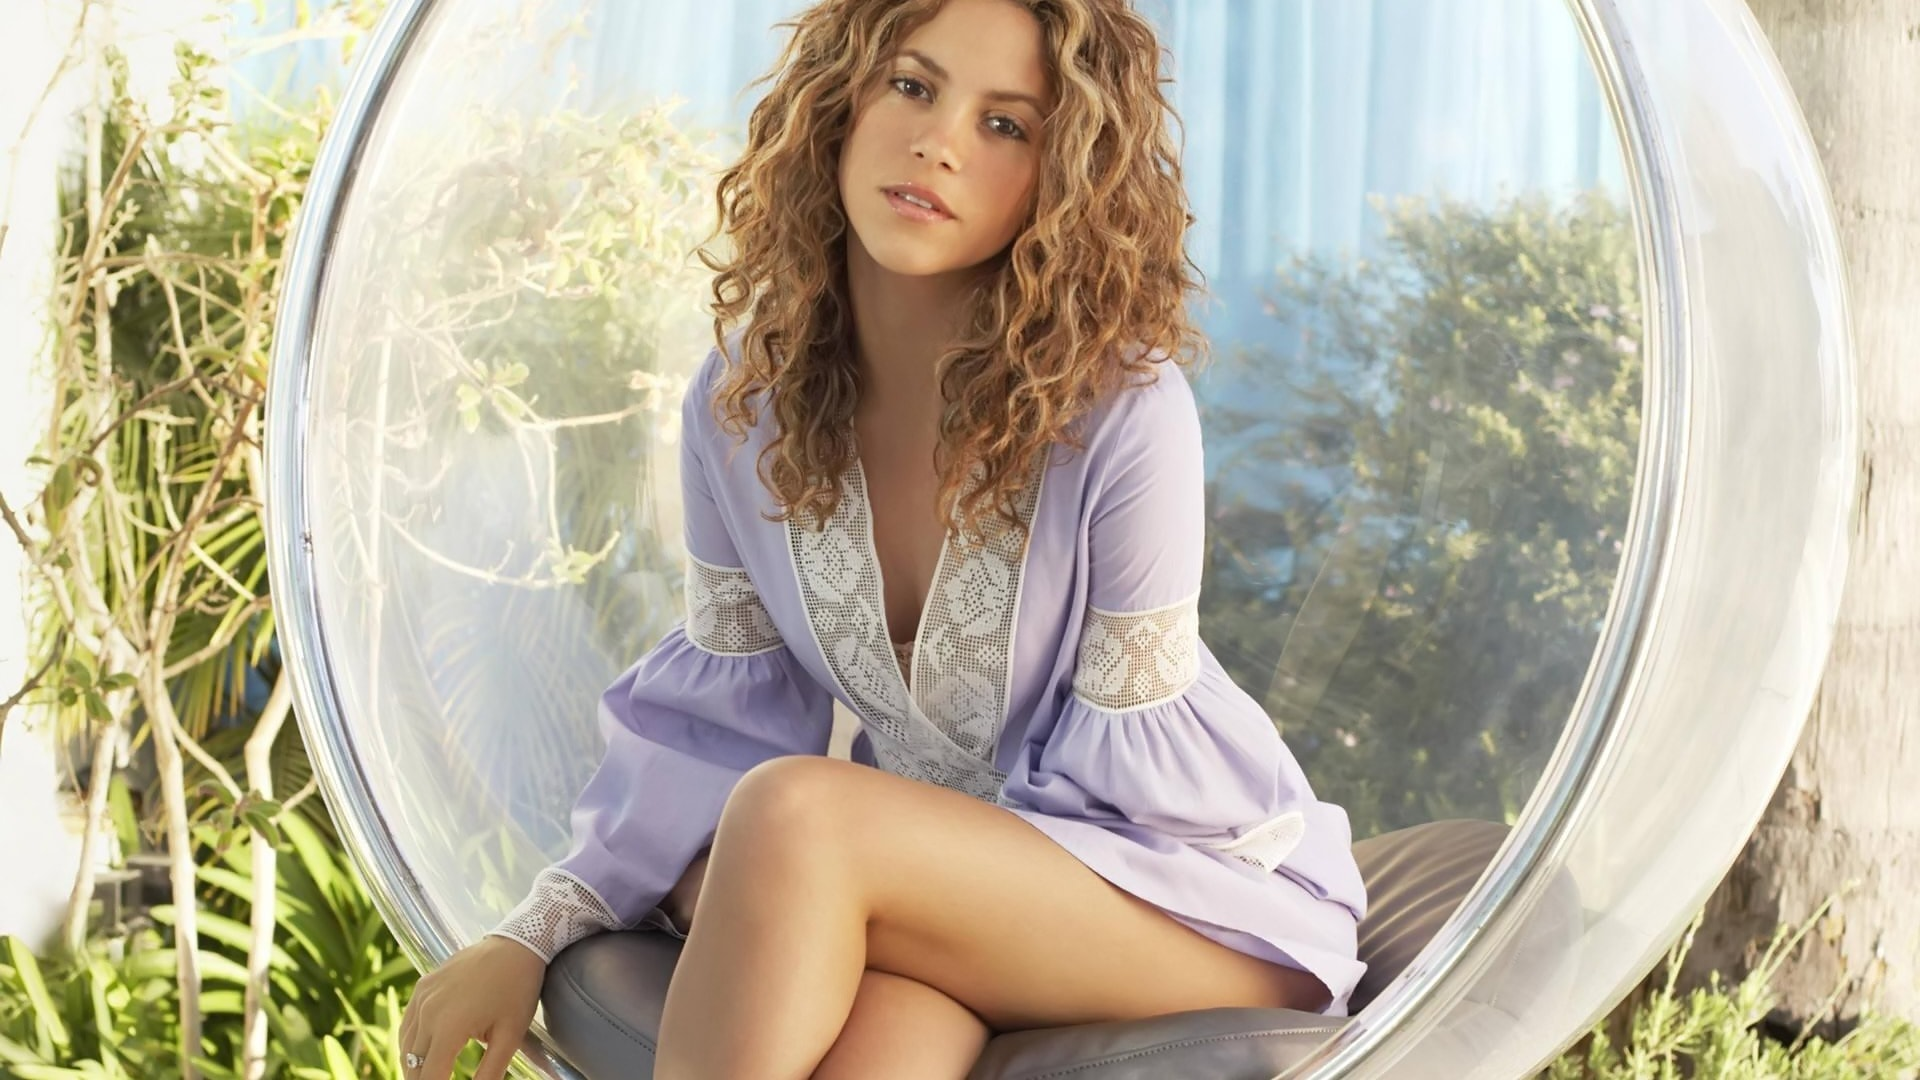 Shakira Hd Wallpapers 7wallpapers Net